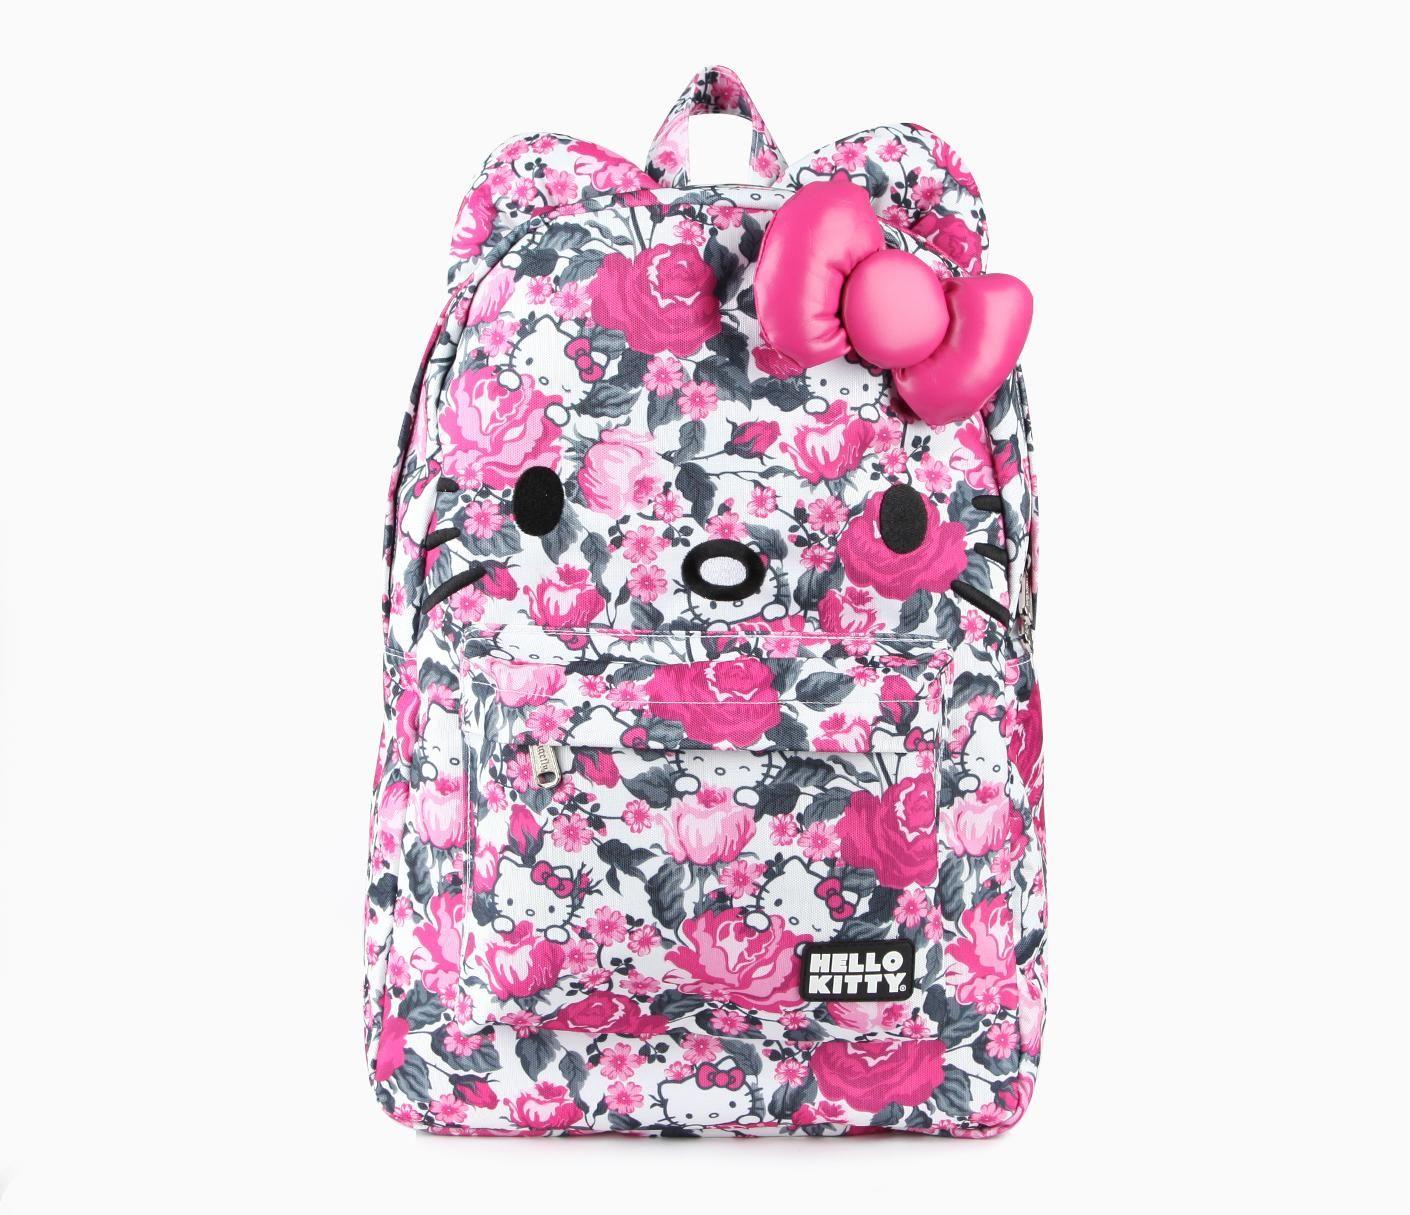 Sanrio hello kitty рюкзак nike найк мужской спортивный рюкзак